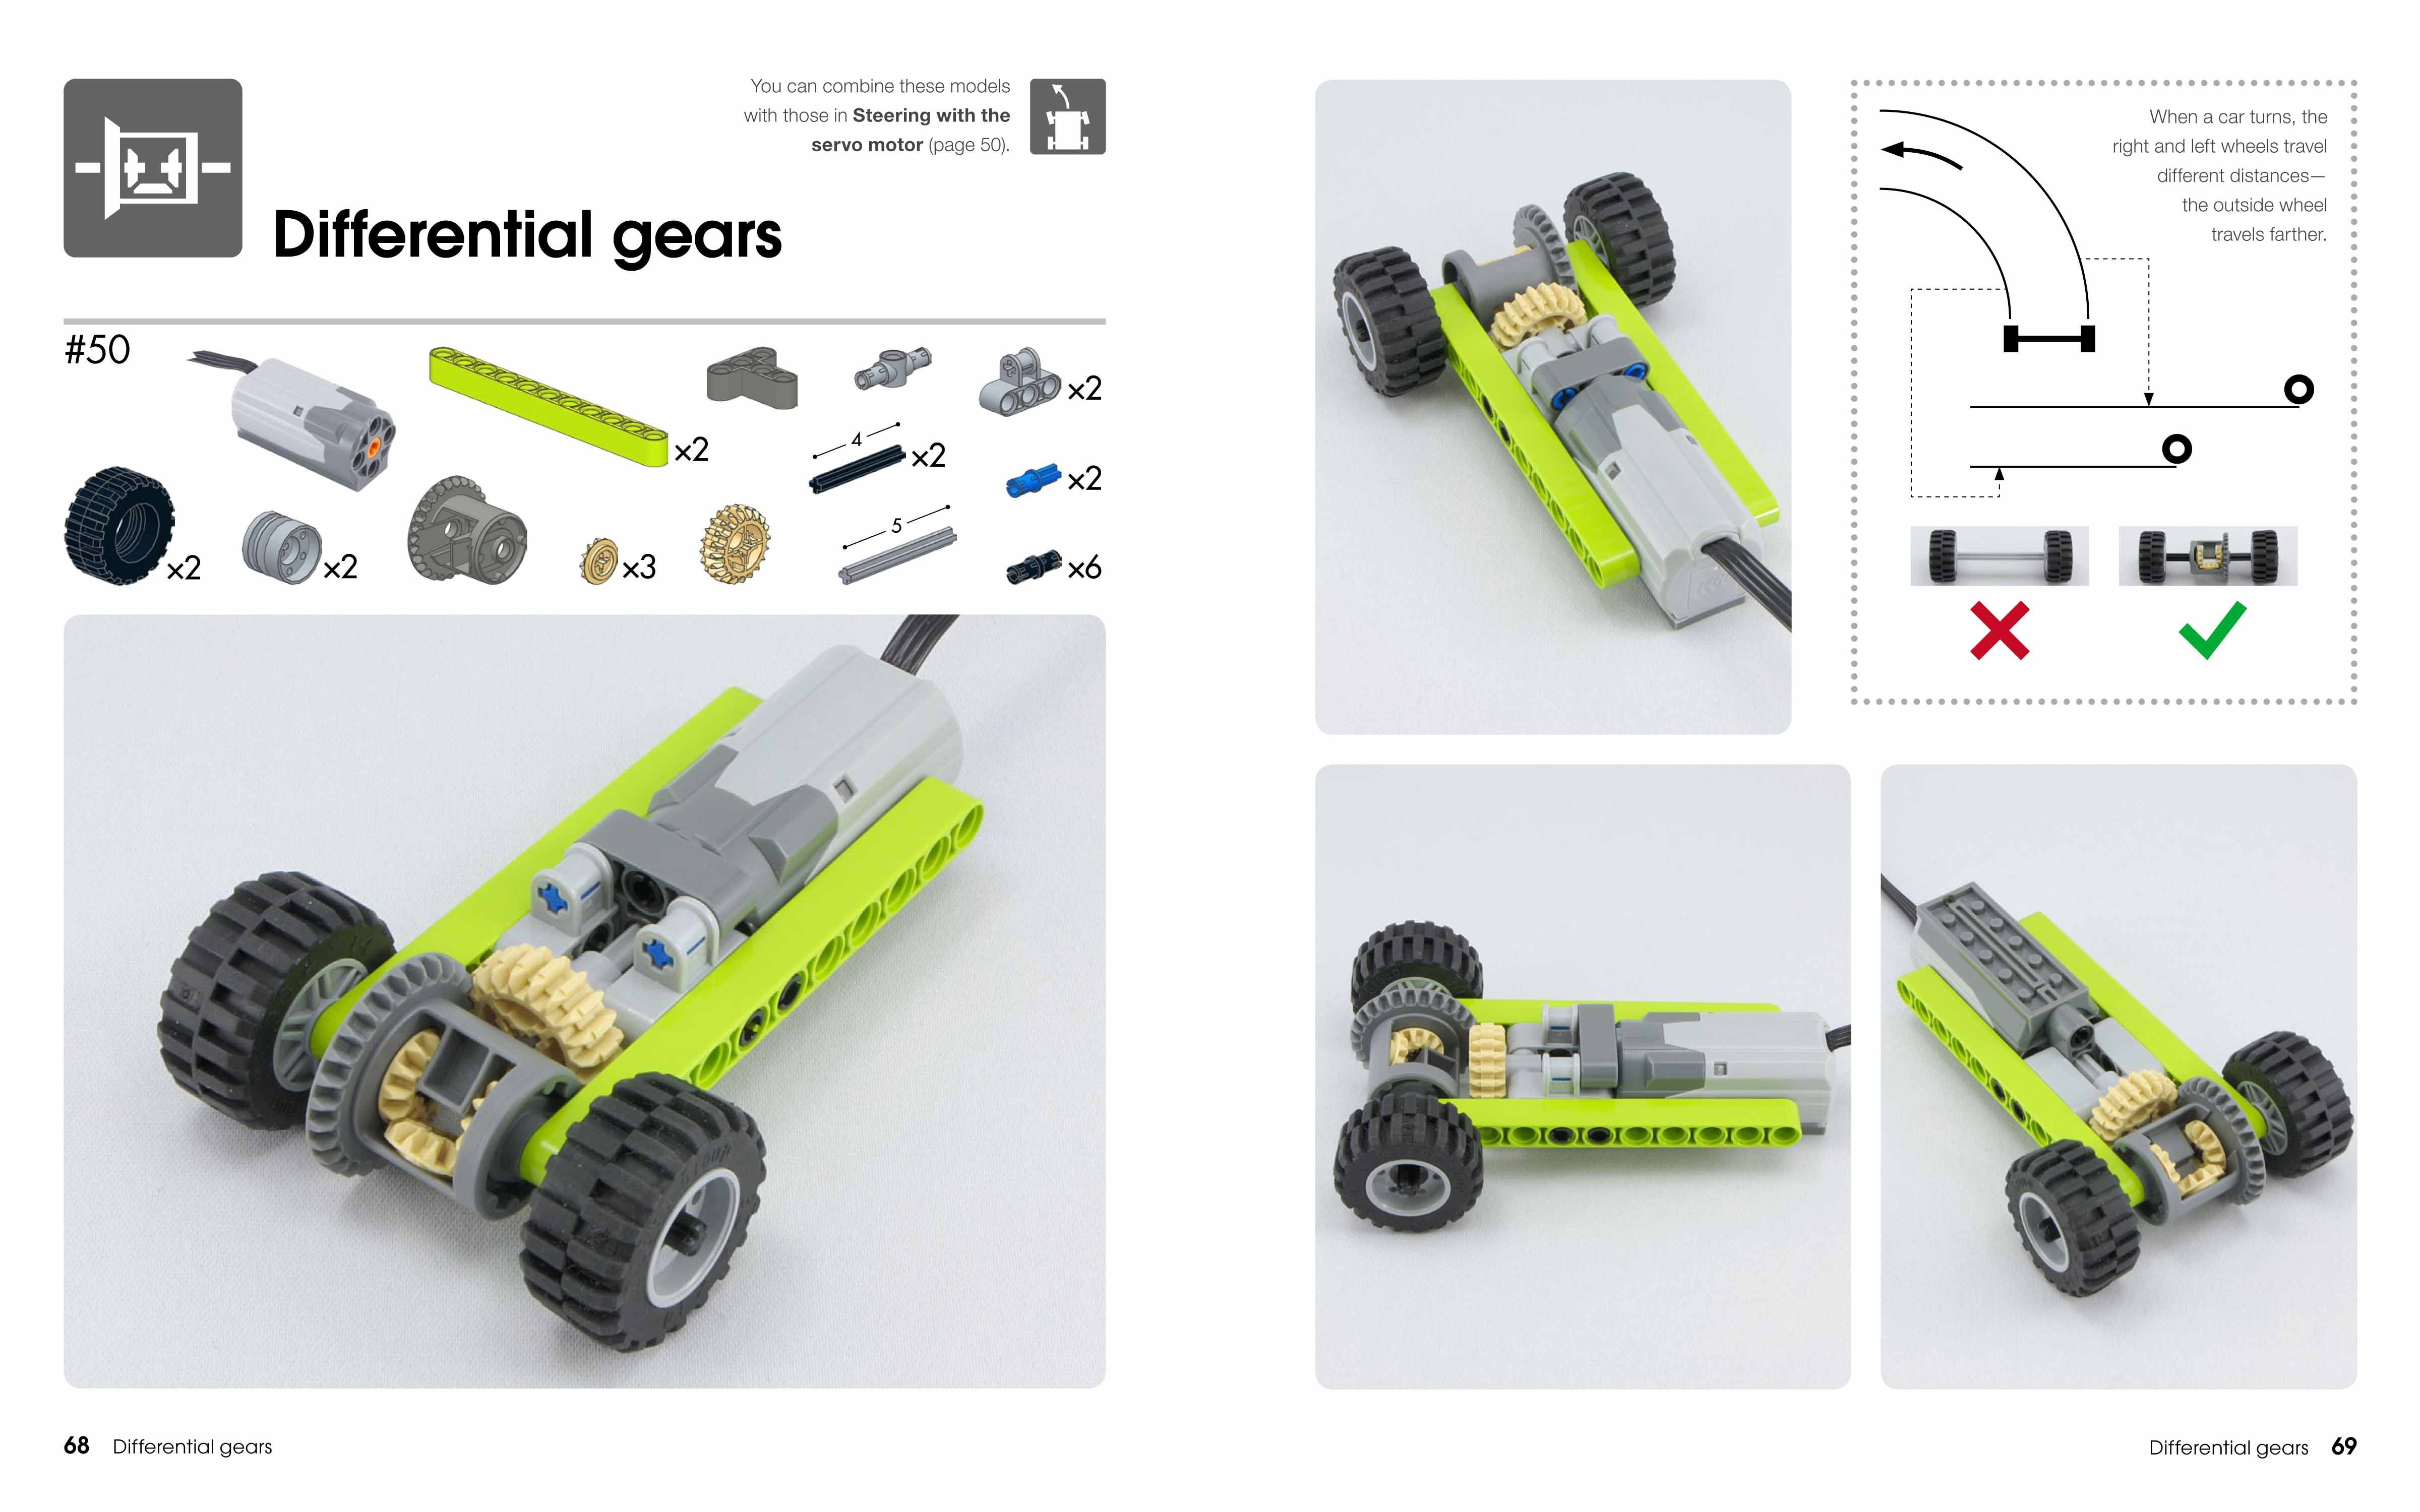 Lego Power Functions Differential Gears | Lego ideas | Lego wedo